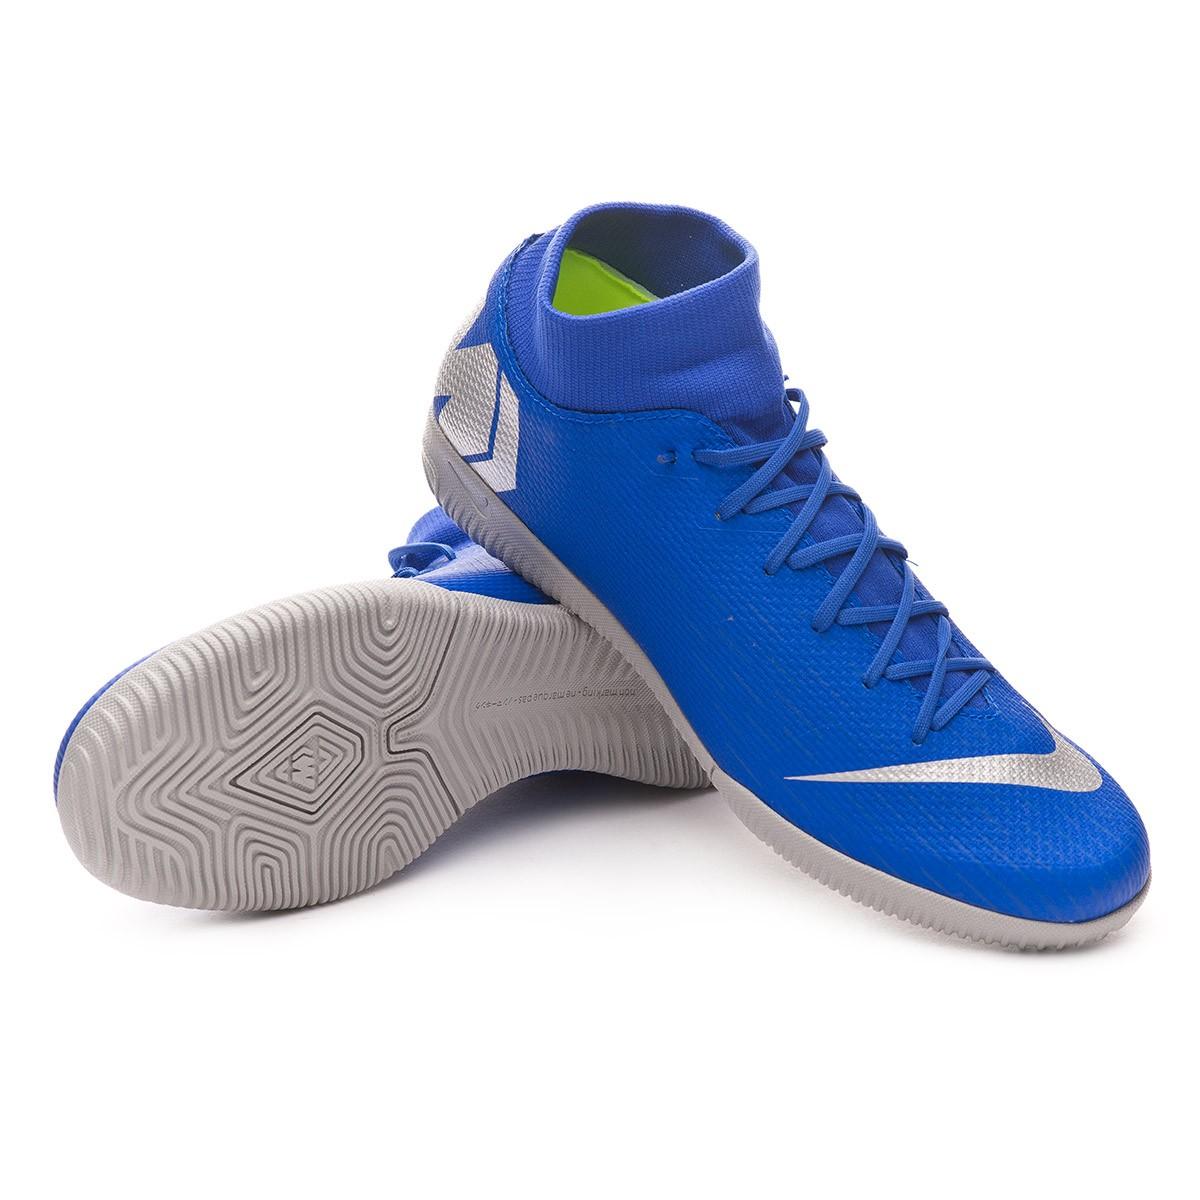 d4d0a664edf Futsal Boot Nike Mercurial SuperflyX VI Academy IC Racer blue-Metallic  silver-Black-Volt - Football store Fútbol Emotion